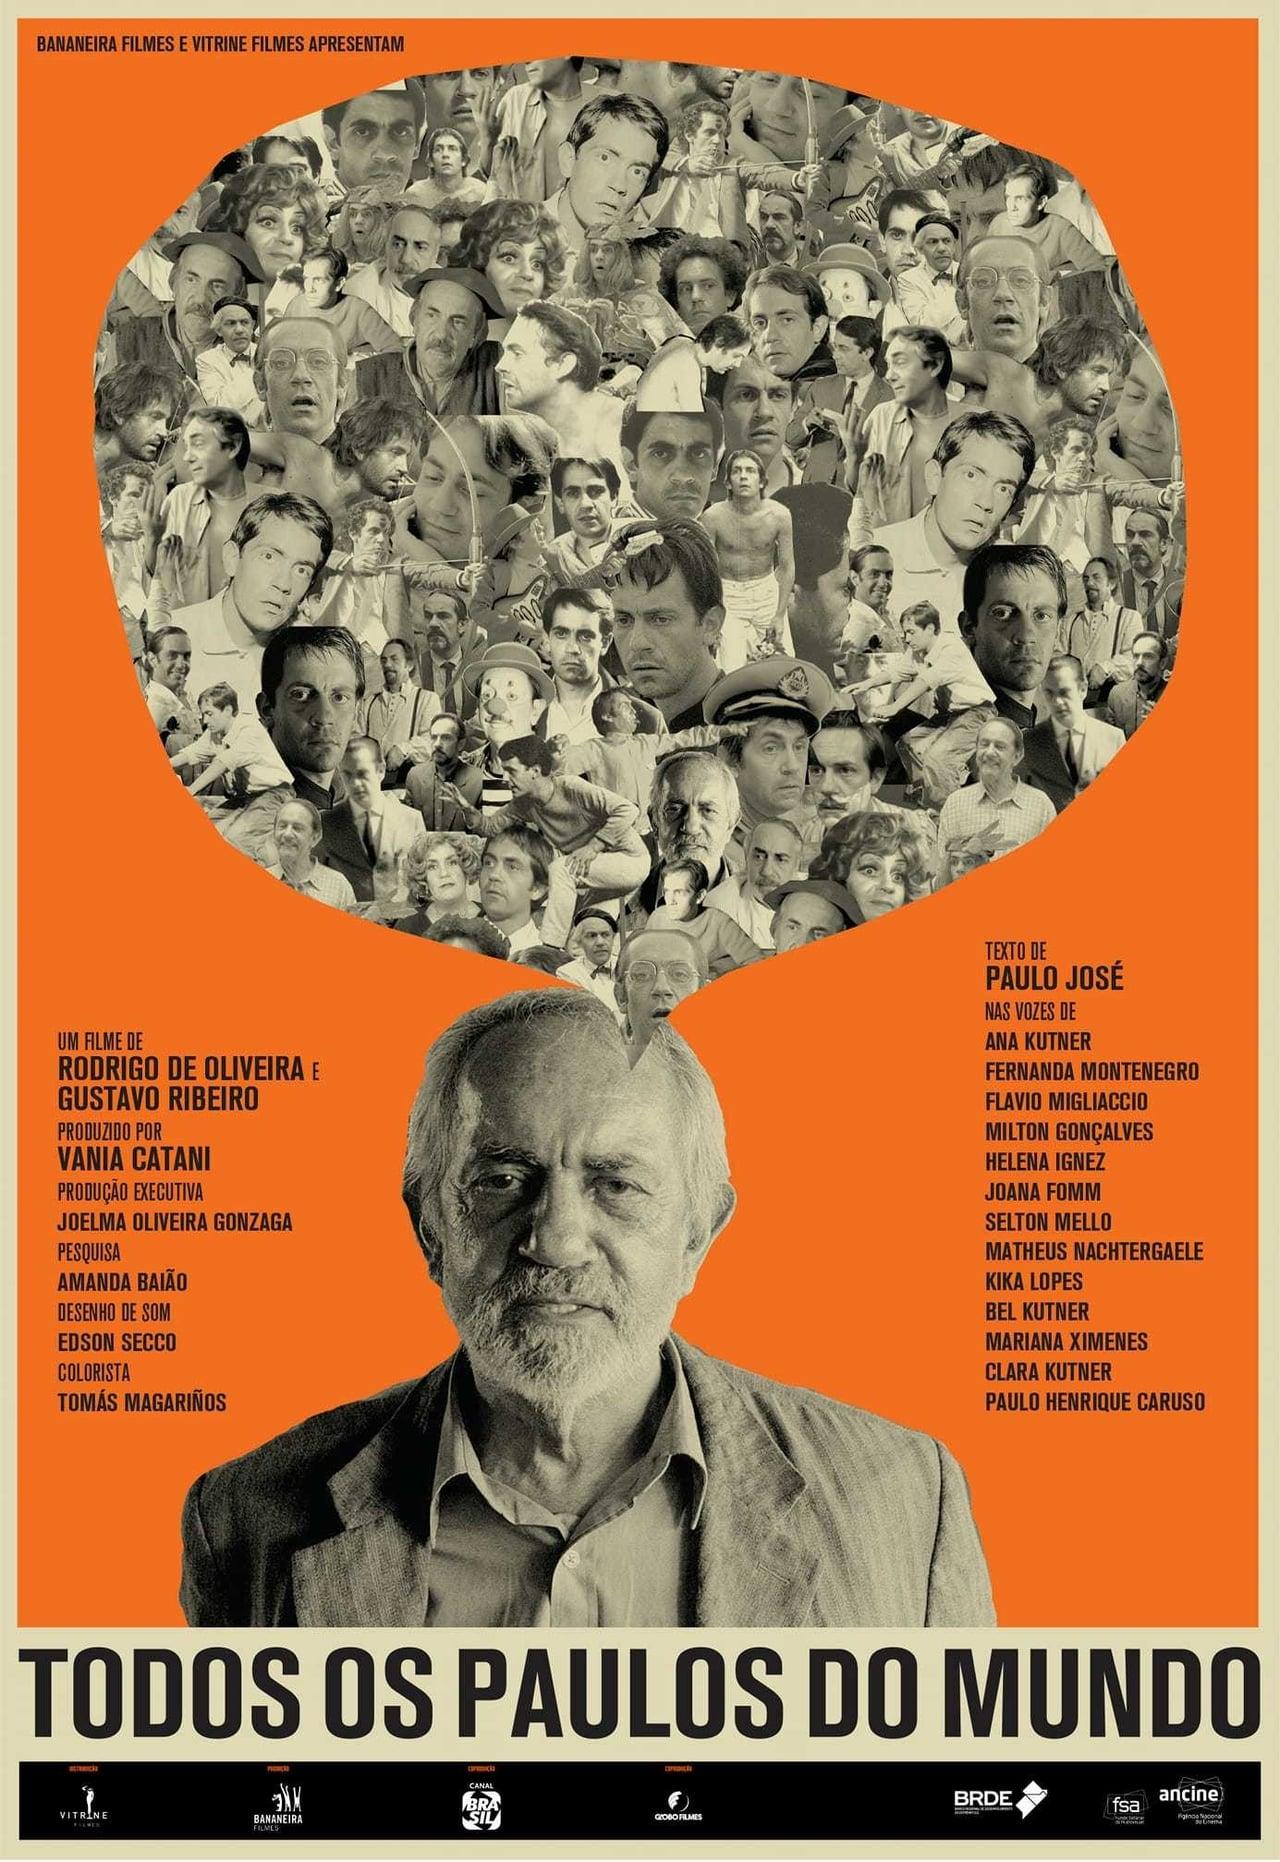 All Paulos in the World - Paulo José